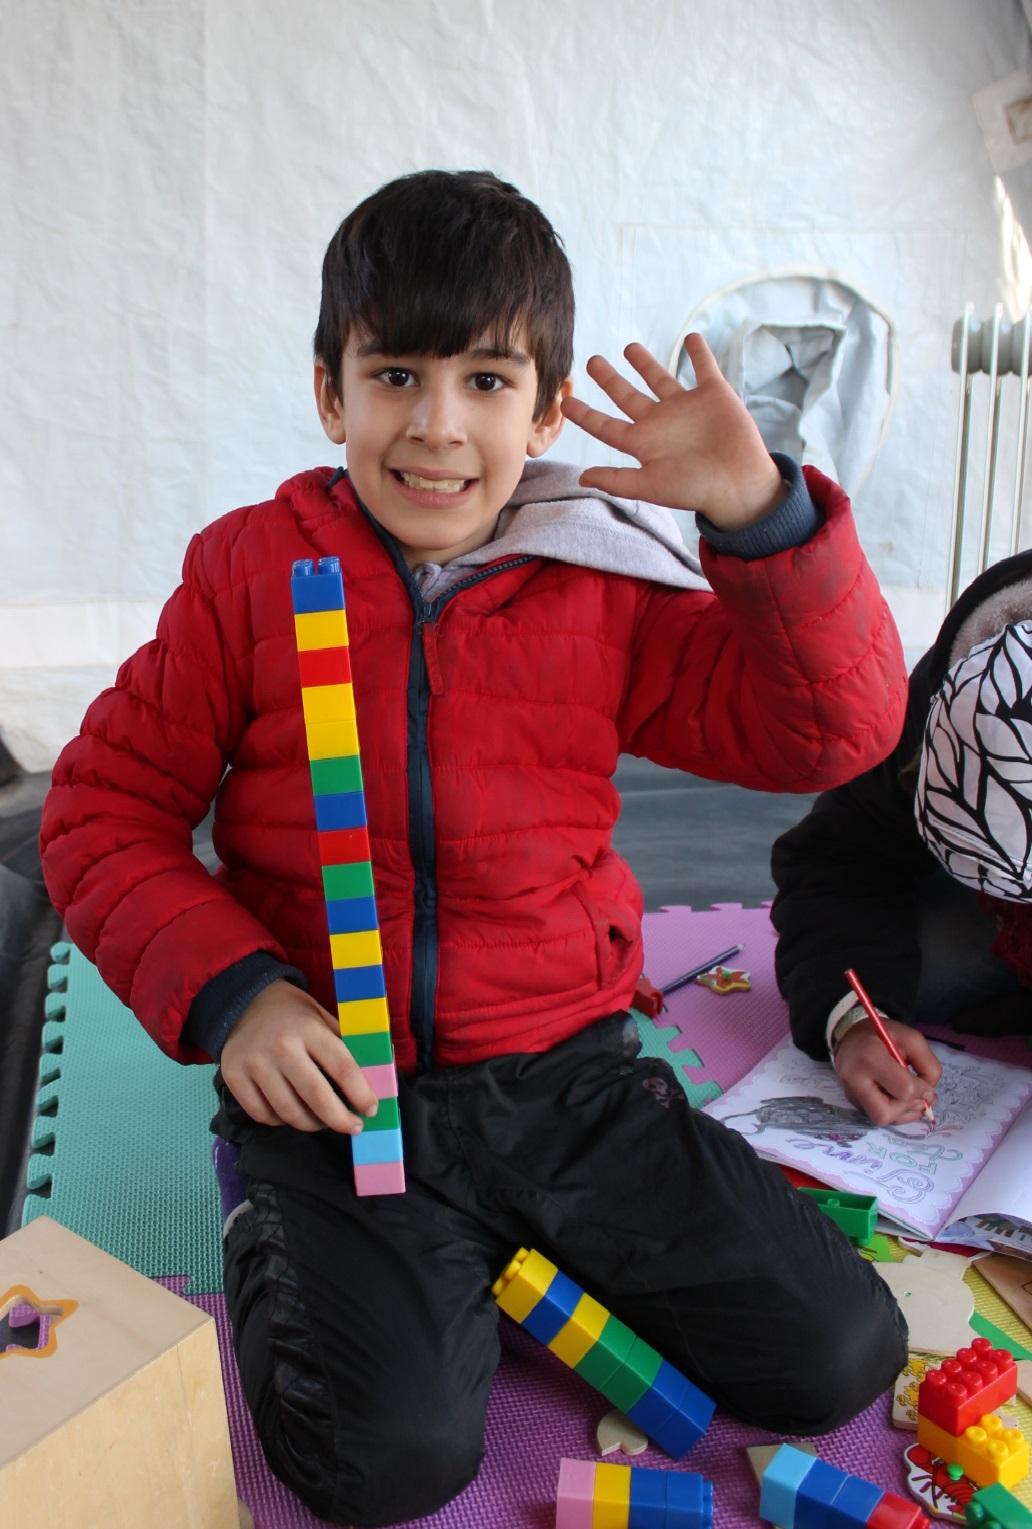 Refugee crisis Serbia